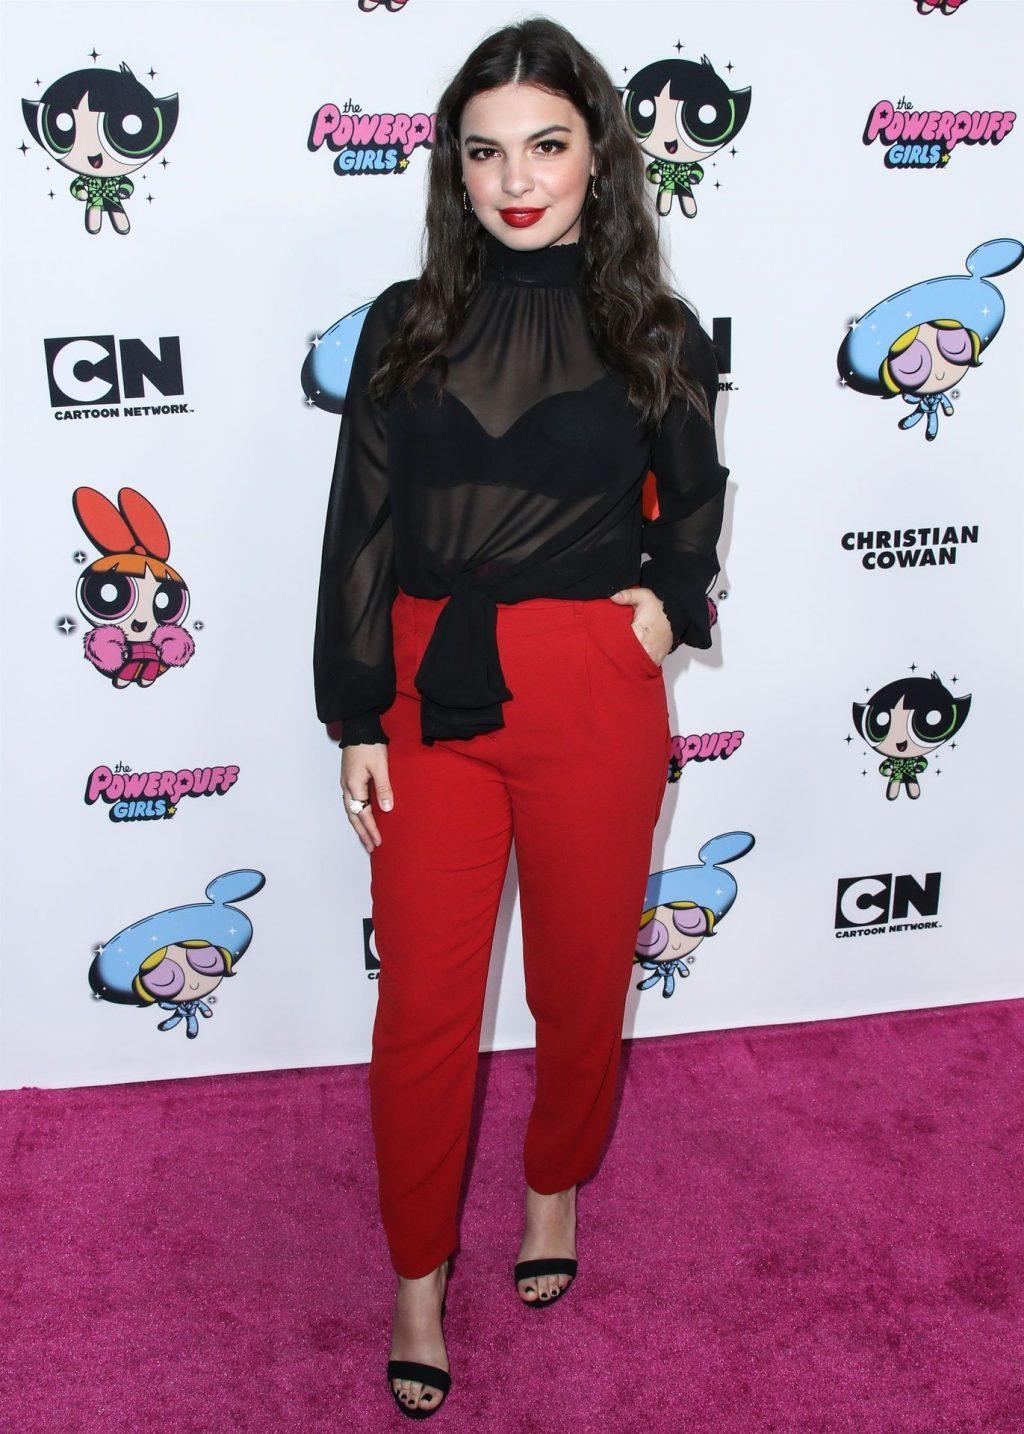 Isabella Gomez Looks Hot at the 2020 Christian Cowan x Powerpuff Girls Runway Show (19 Photos)